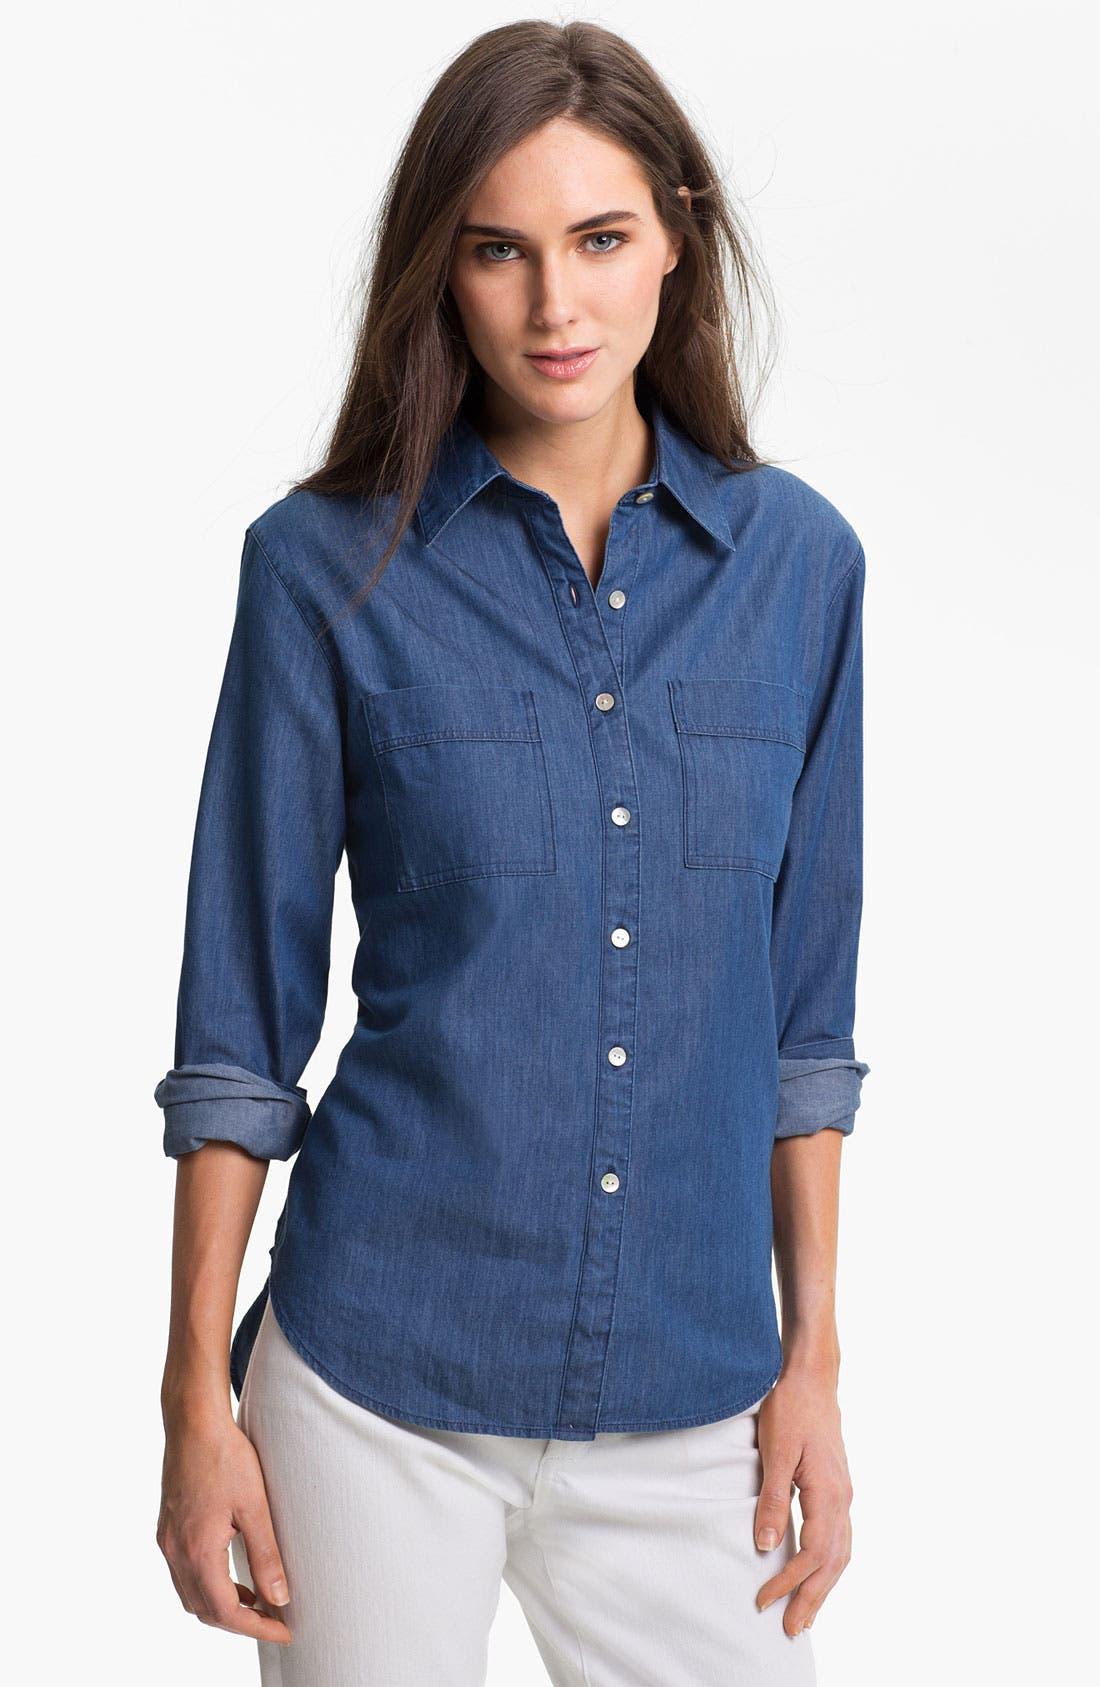 Main Image - Foxcroft Two Pocket Denim Shirt